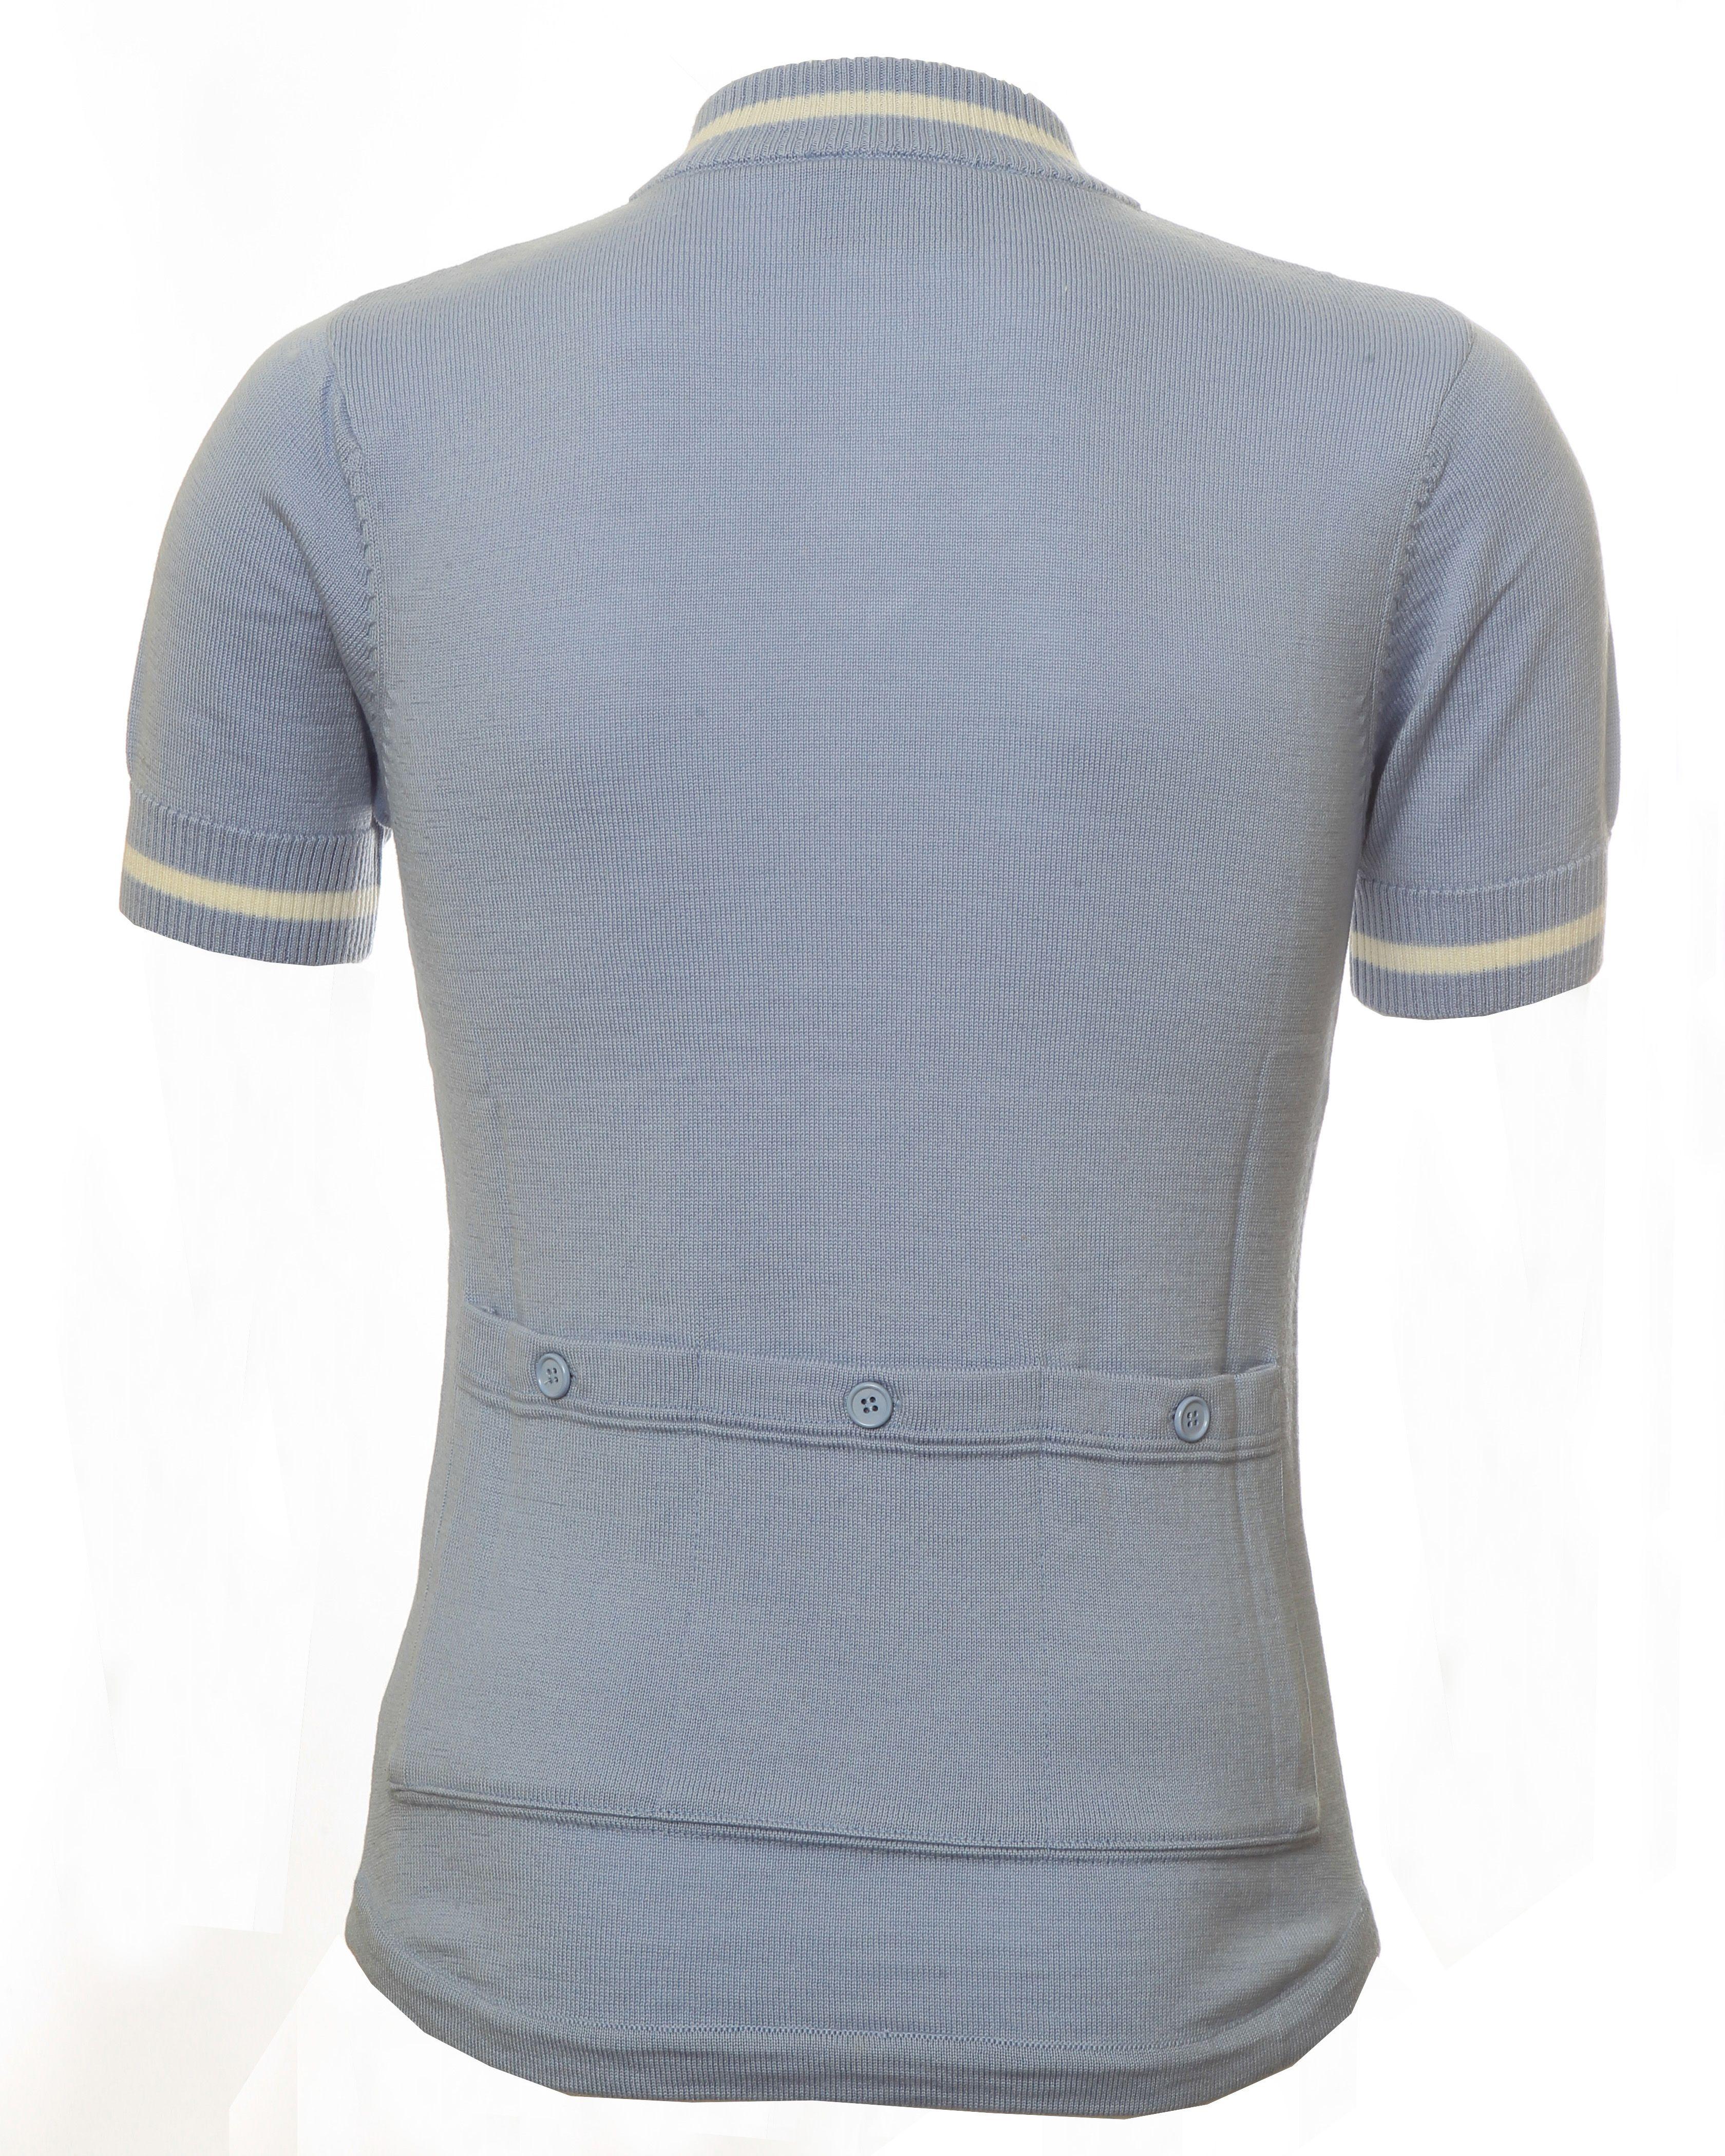 Pale Blue Ecru 100 Merino Wool Retro Cycling Jersey From Jura